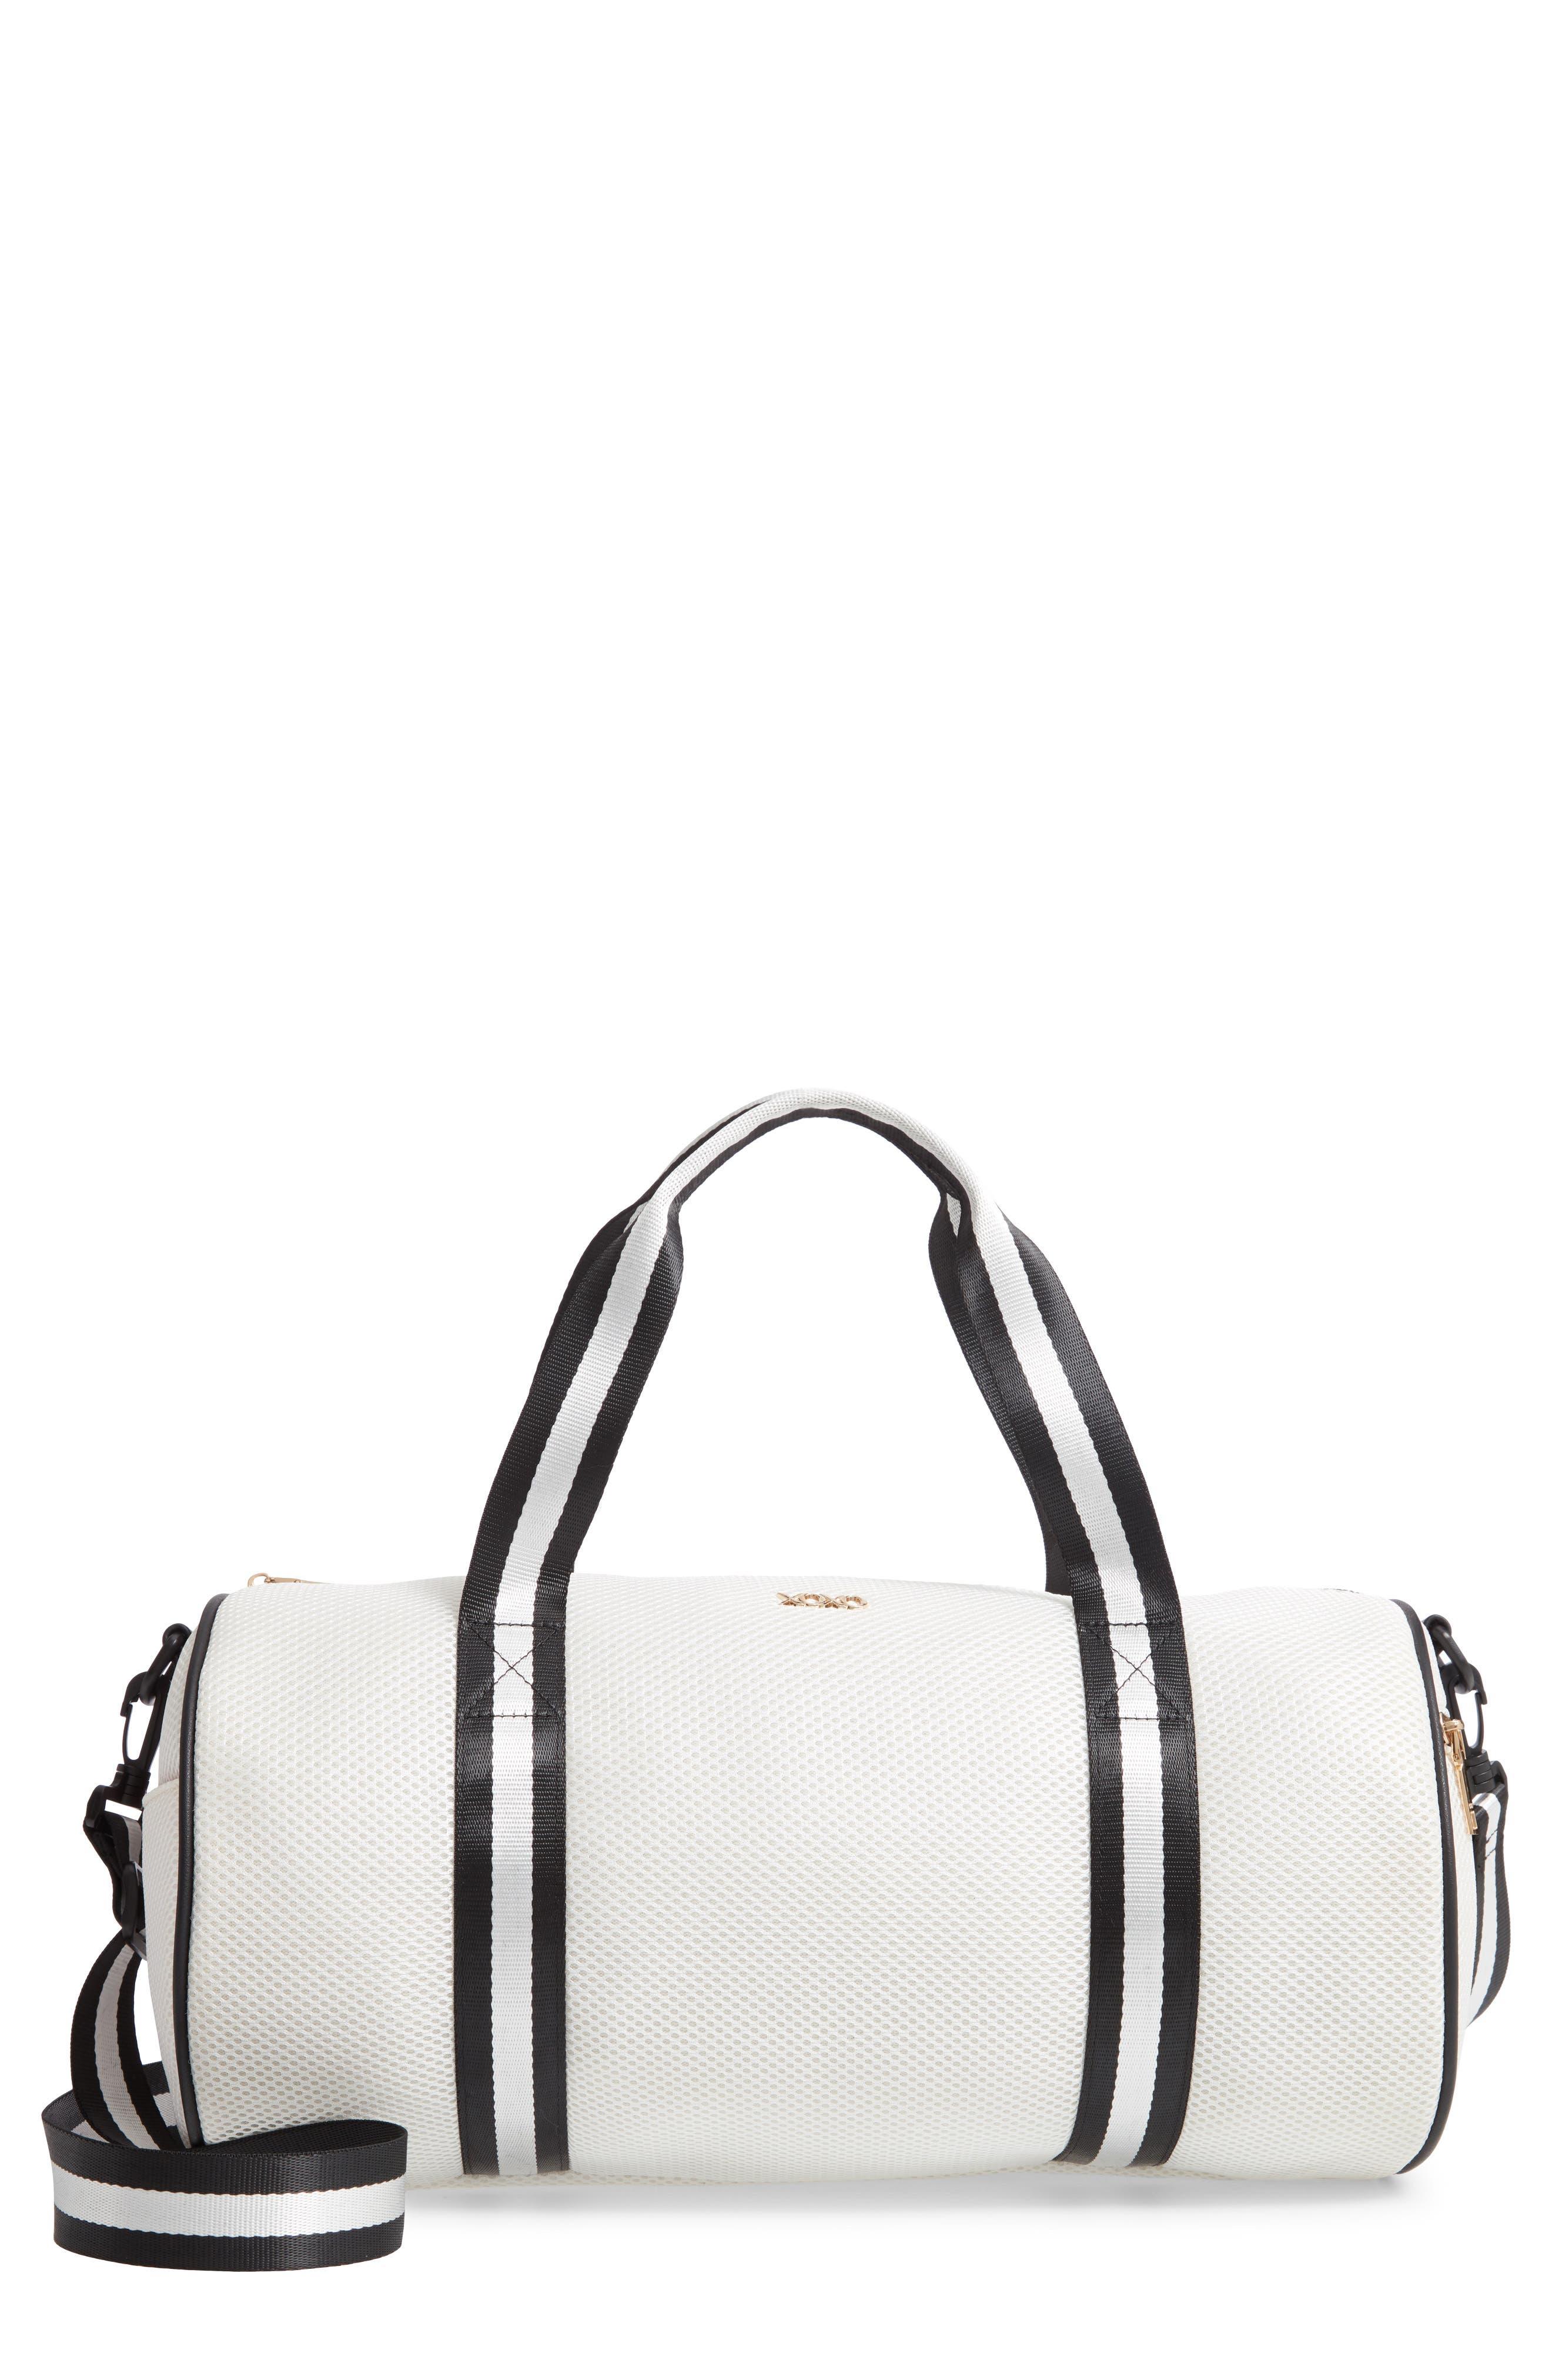 YOKI BAGS, Mesh Duffle Bag, Main thumbnail 1, color, WHITE MULTI